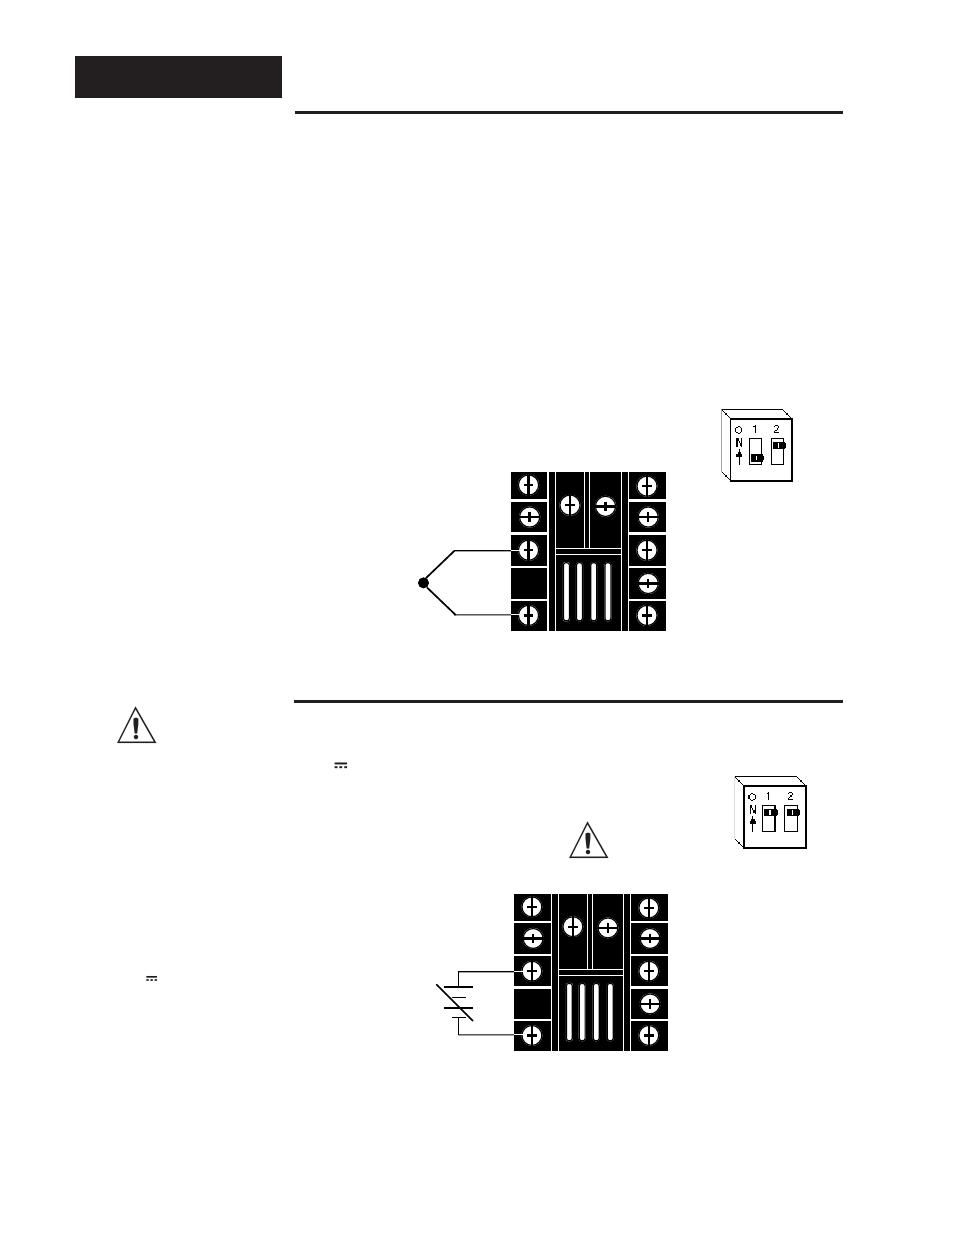 hight resolution of input wiring sensor installation guidelines thermocouple input thermocouple sensor input wiring dc